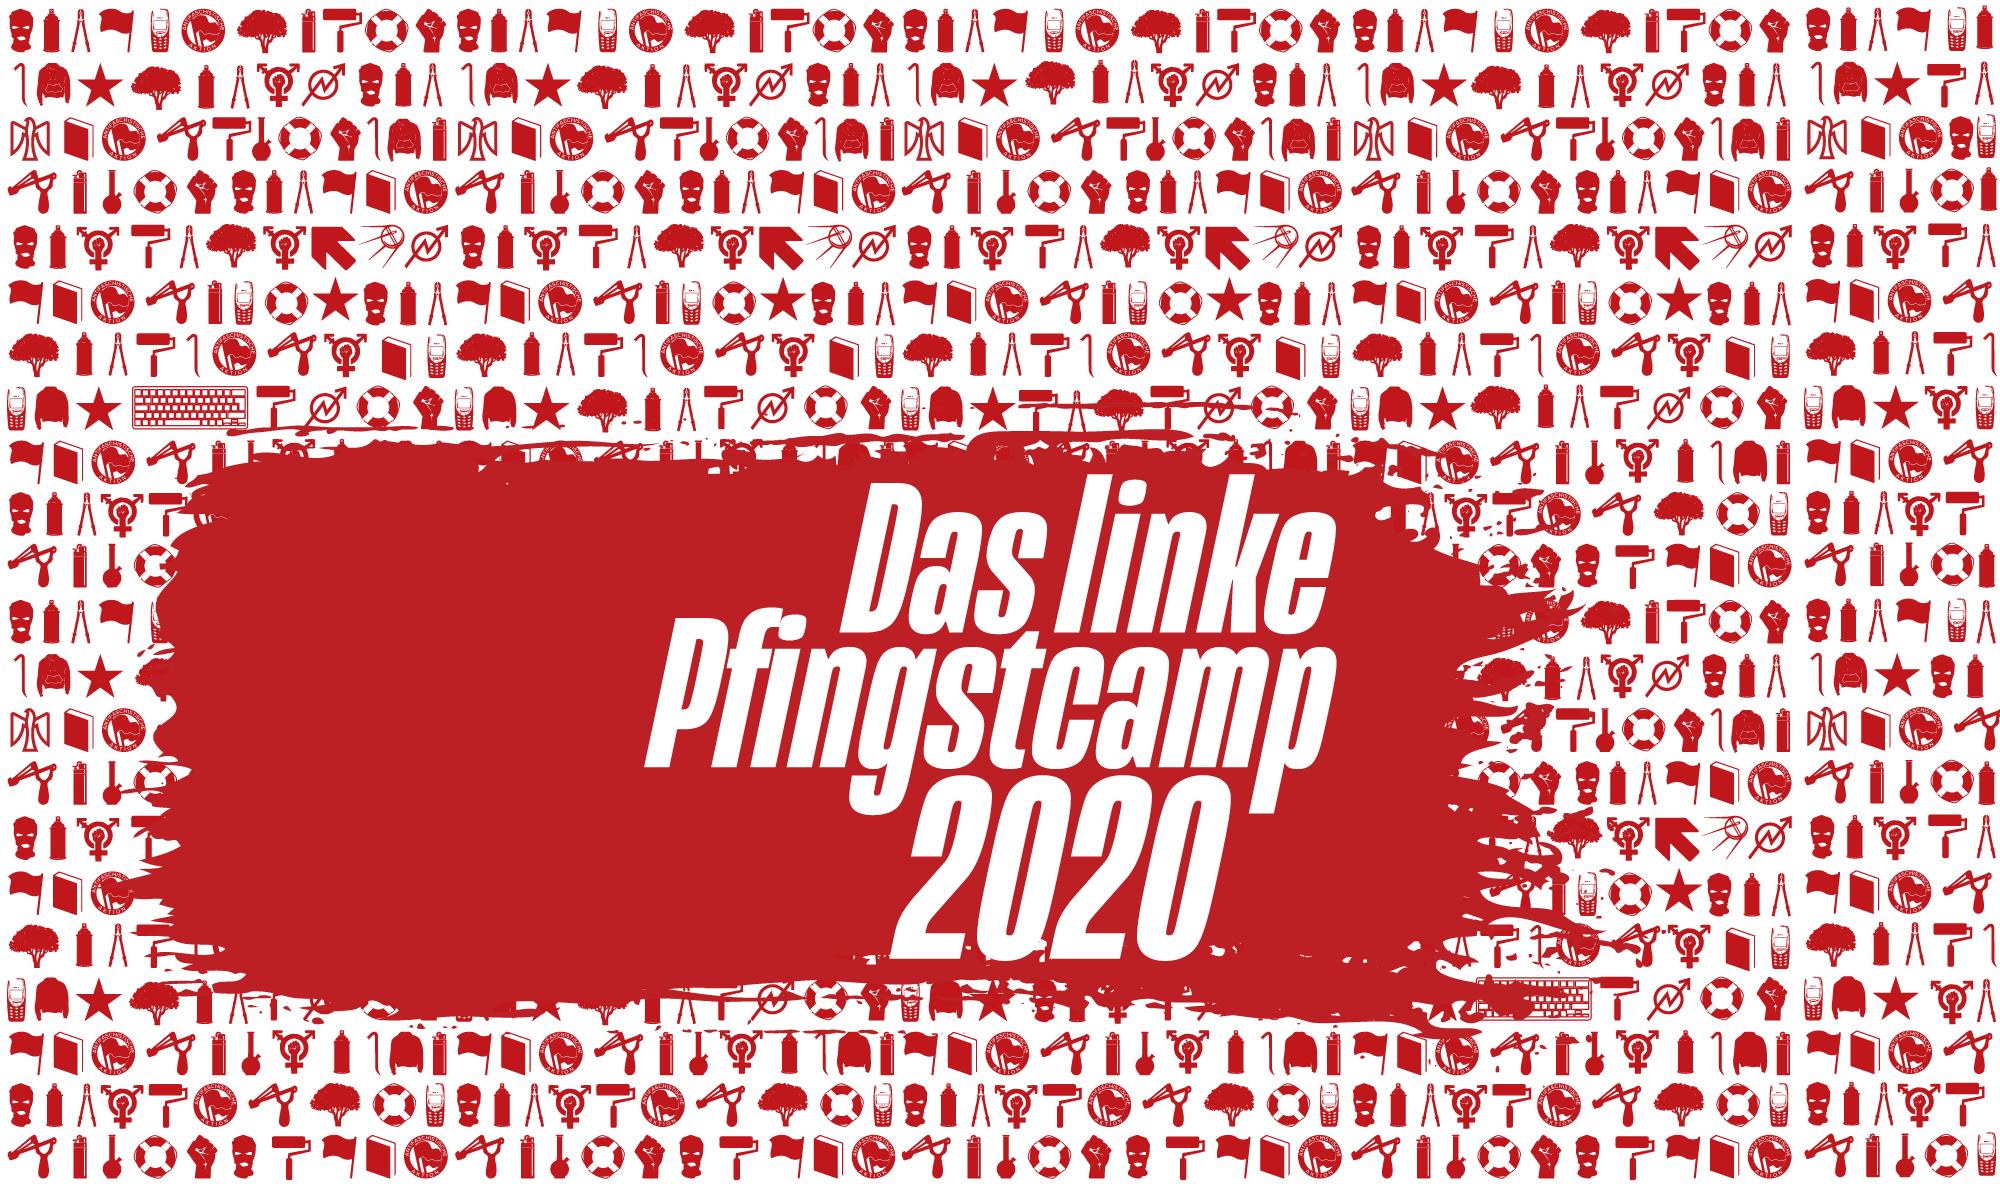 Das linke Pfingstcamp